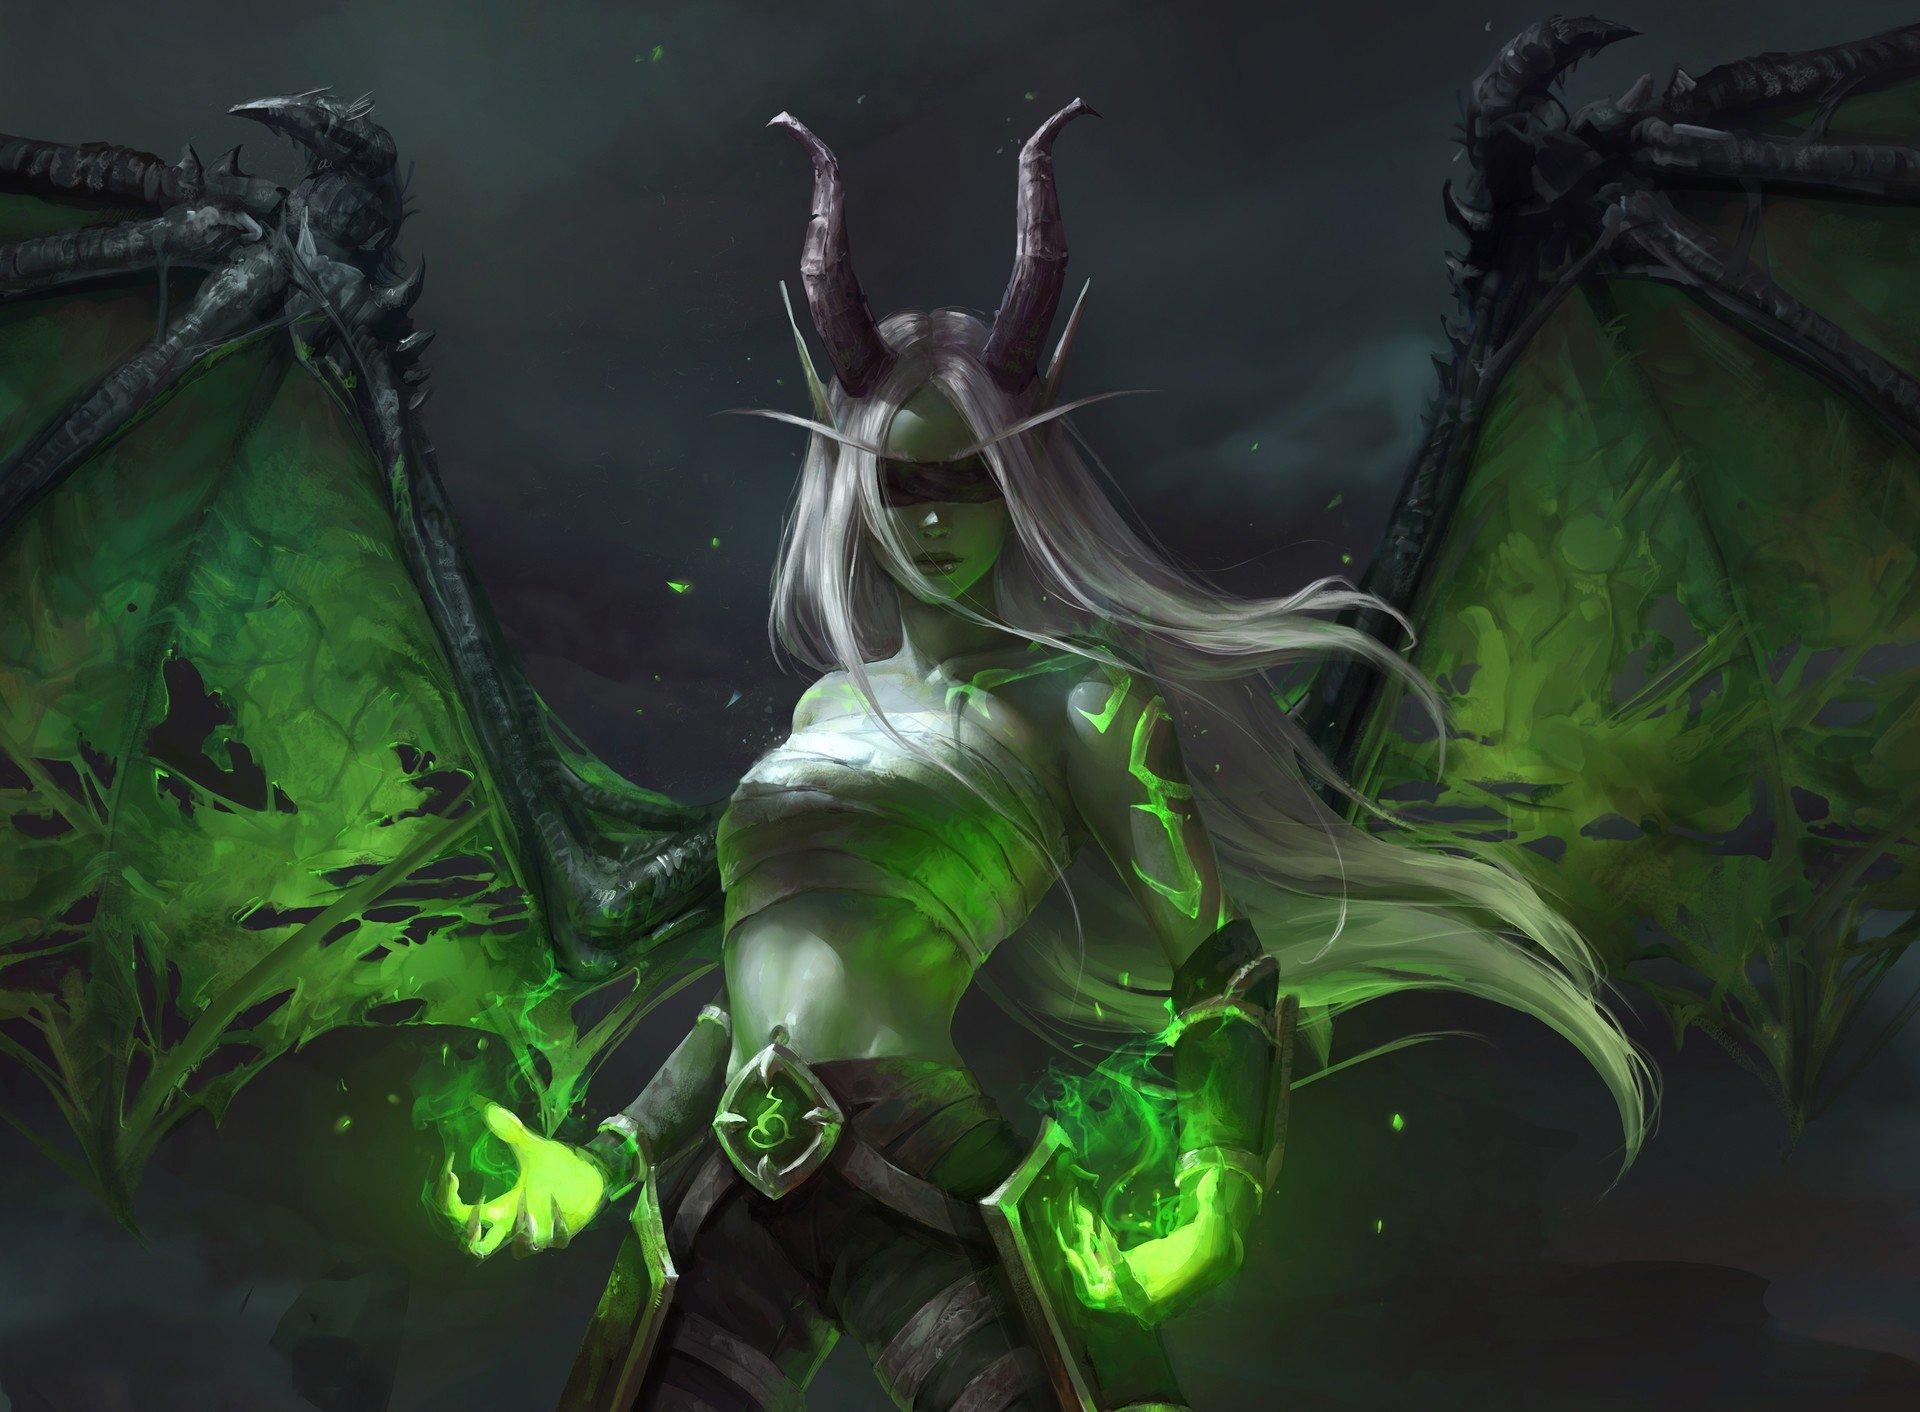 wallpaper 1920x1412 px blood elf demon demon hunter illidari